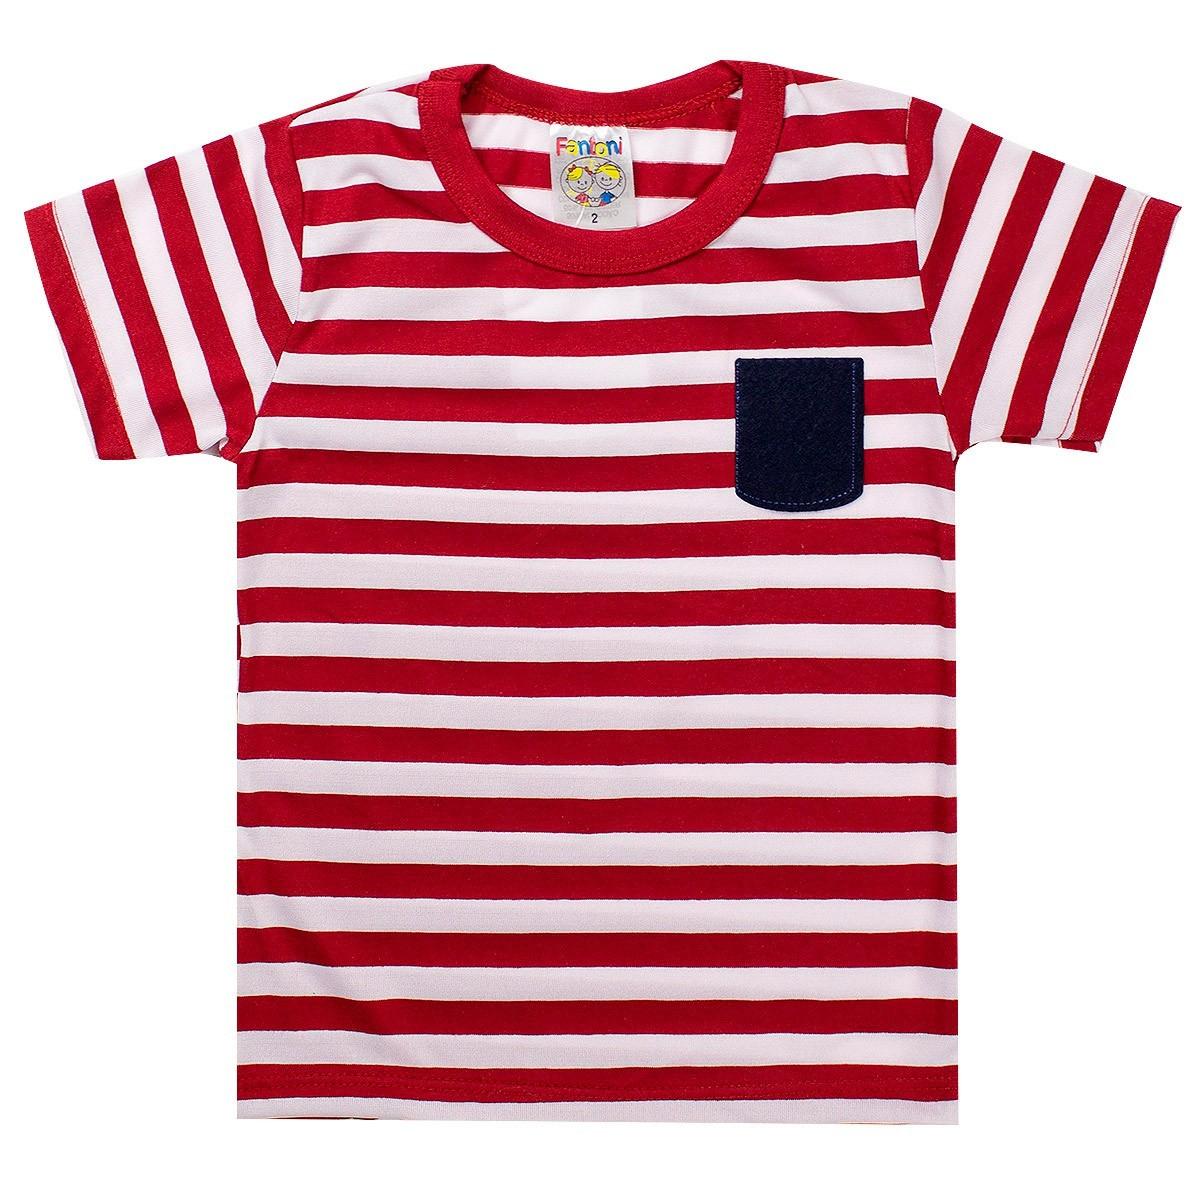 Camiseta Infantil Menino Listrada Vermelho - Fantoni